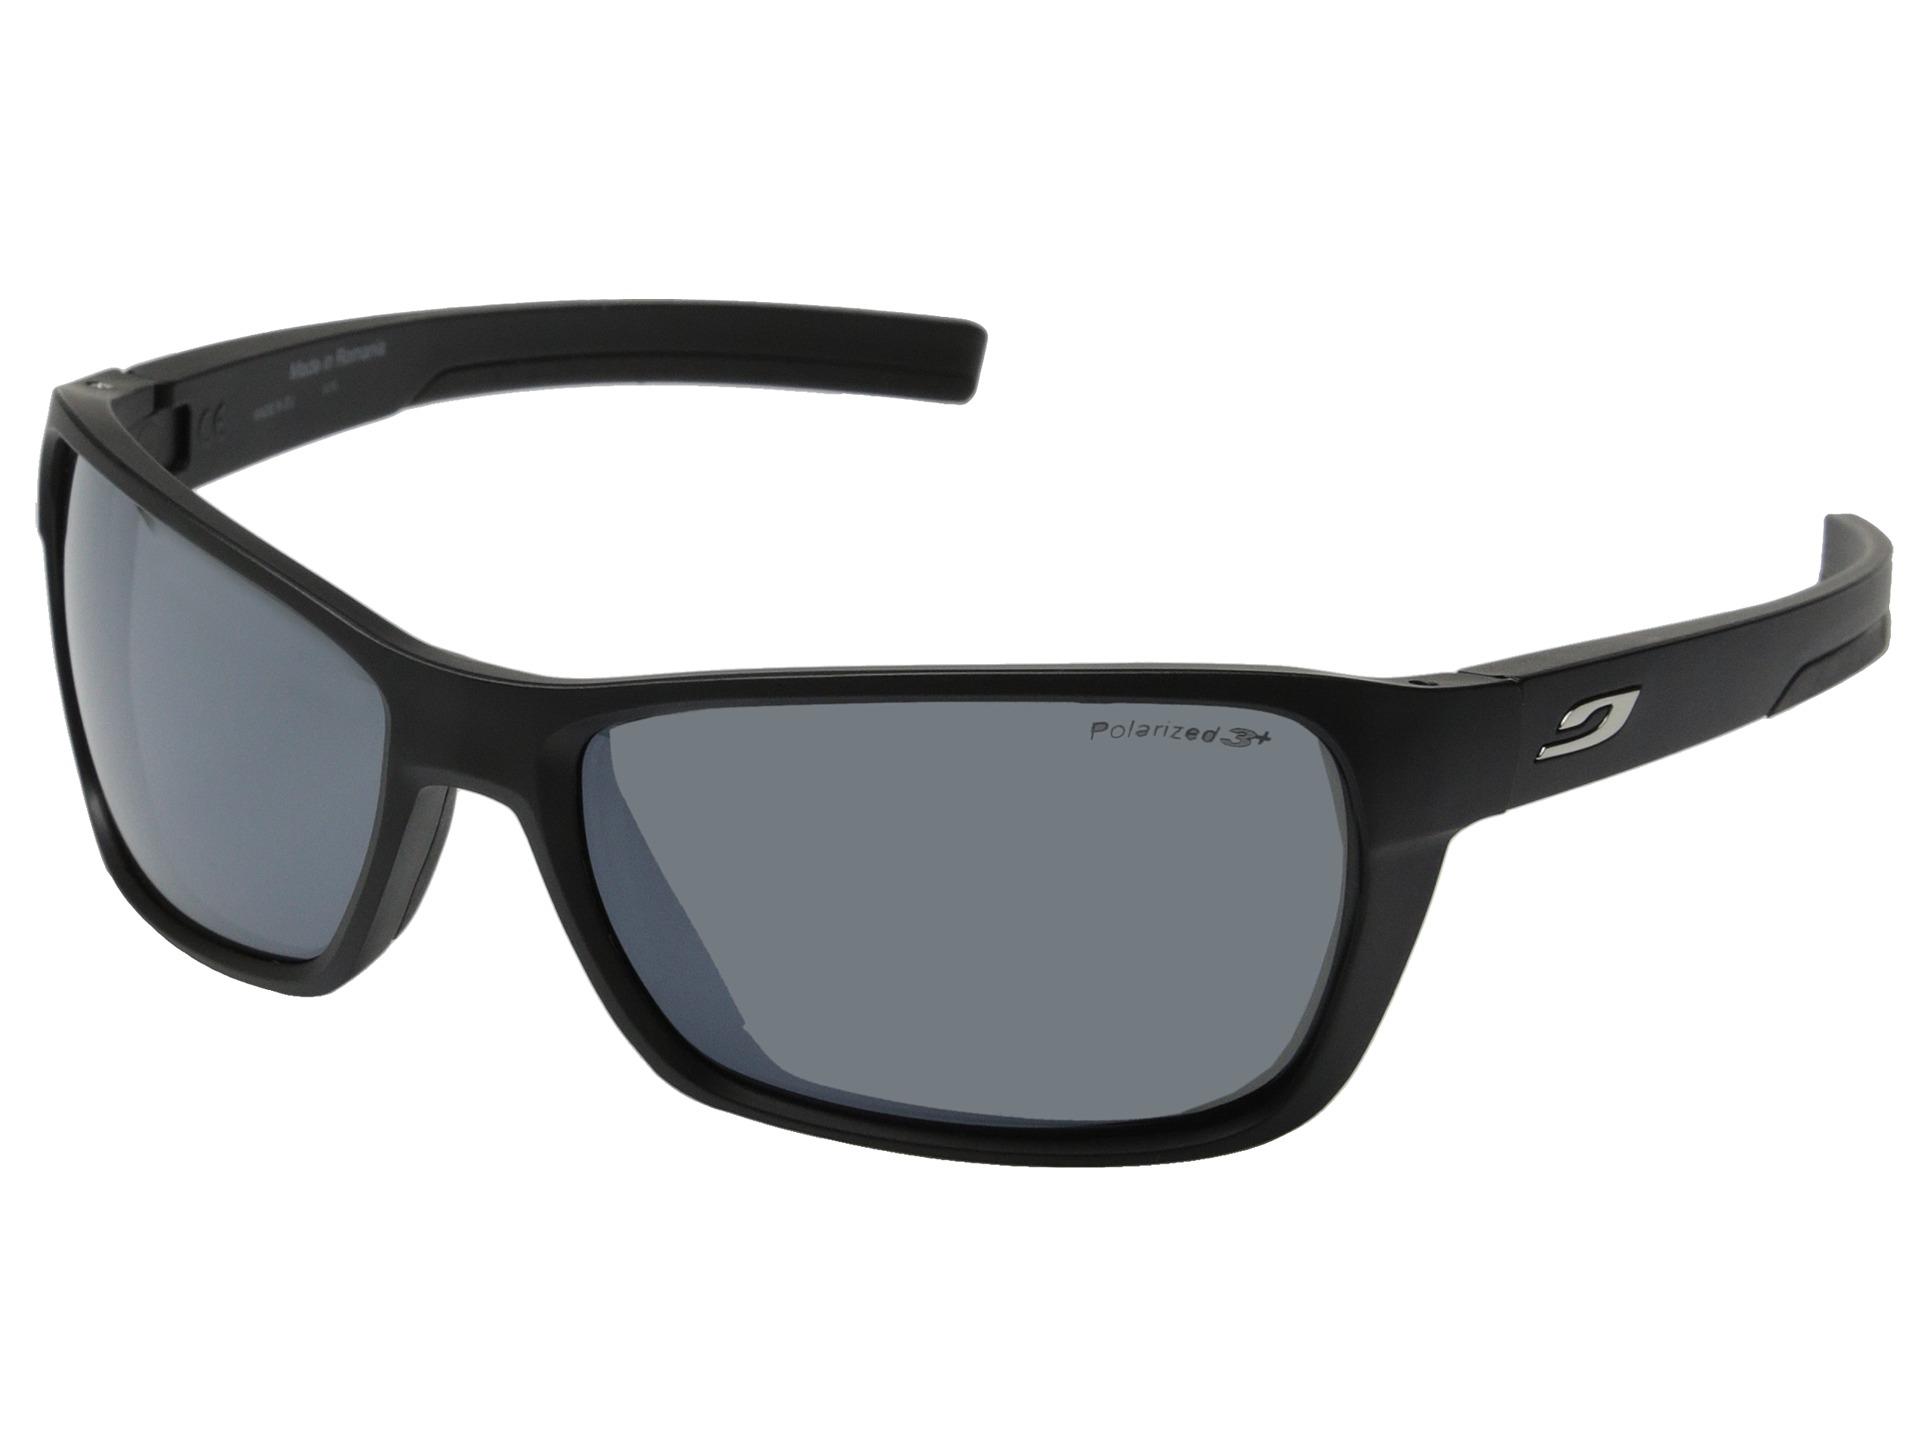 Performance Sunglasses  julbo eyewear blast performance sunglasses zappos com free